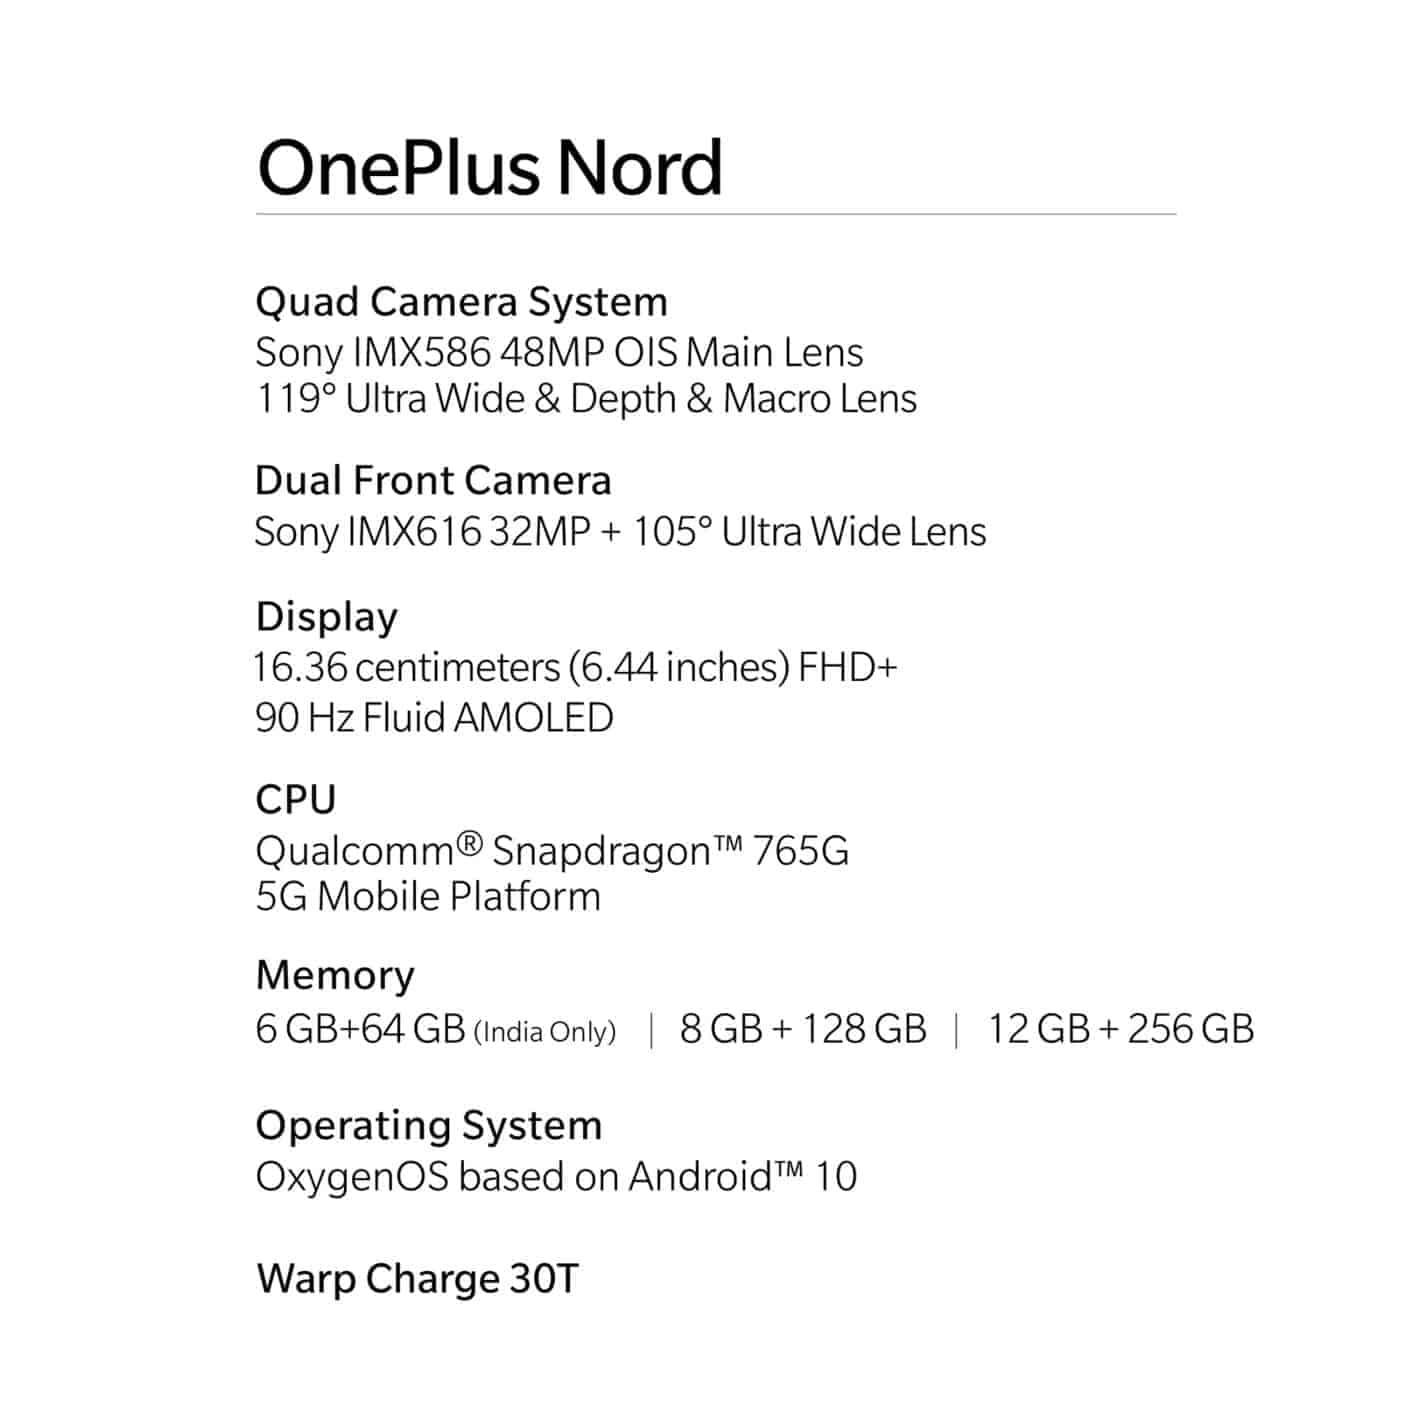 oneplus 2020 Jul 21